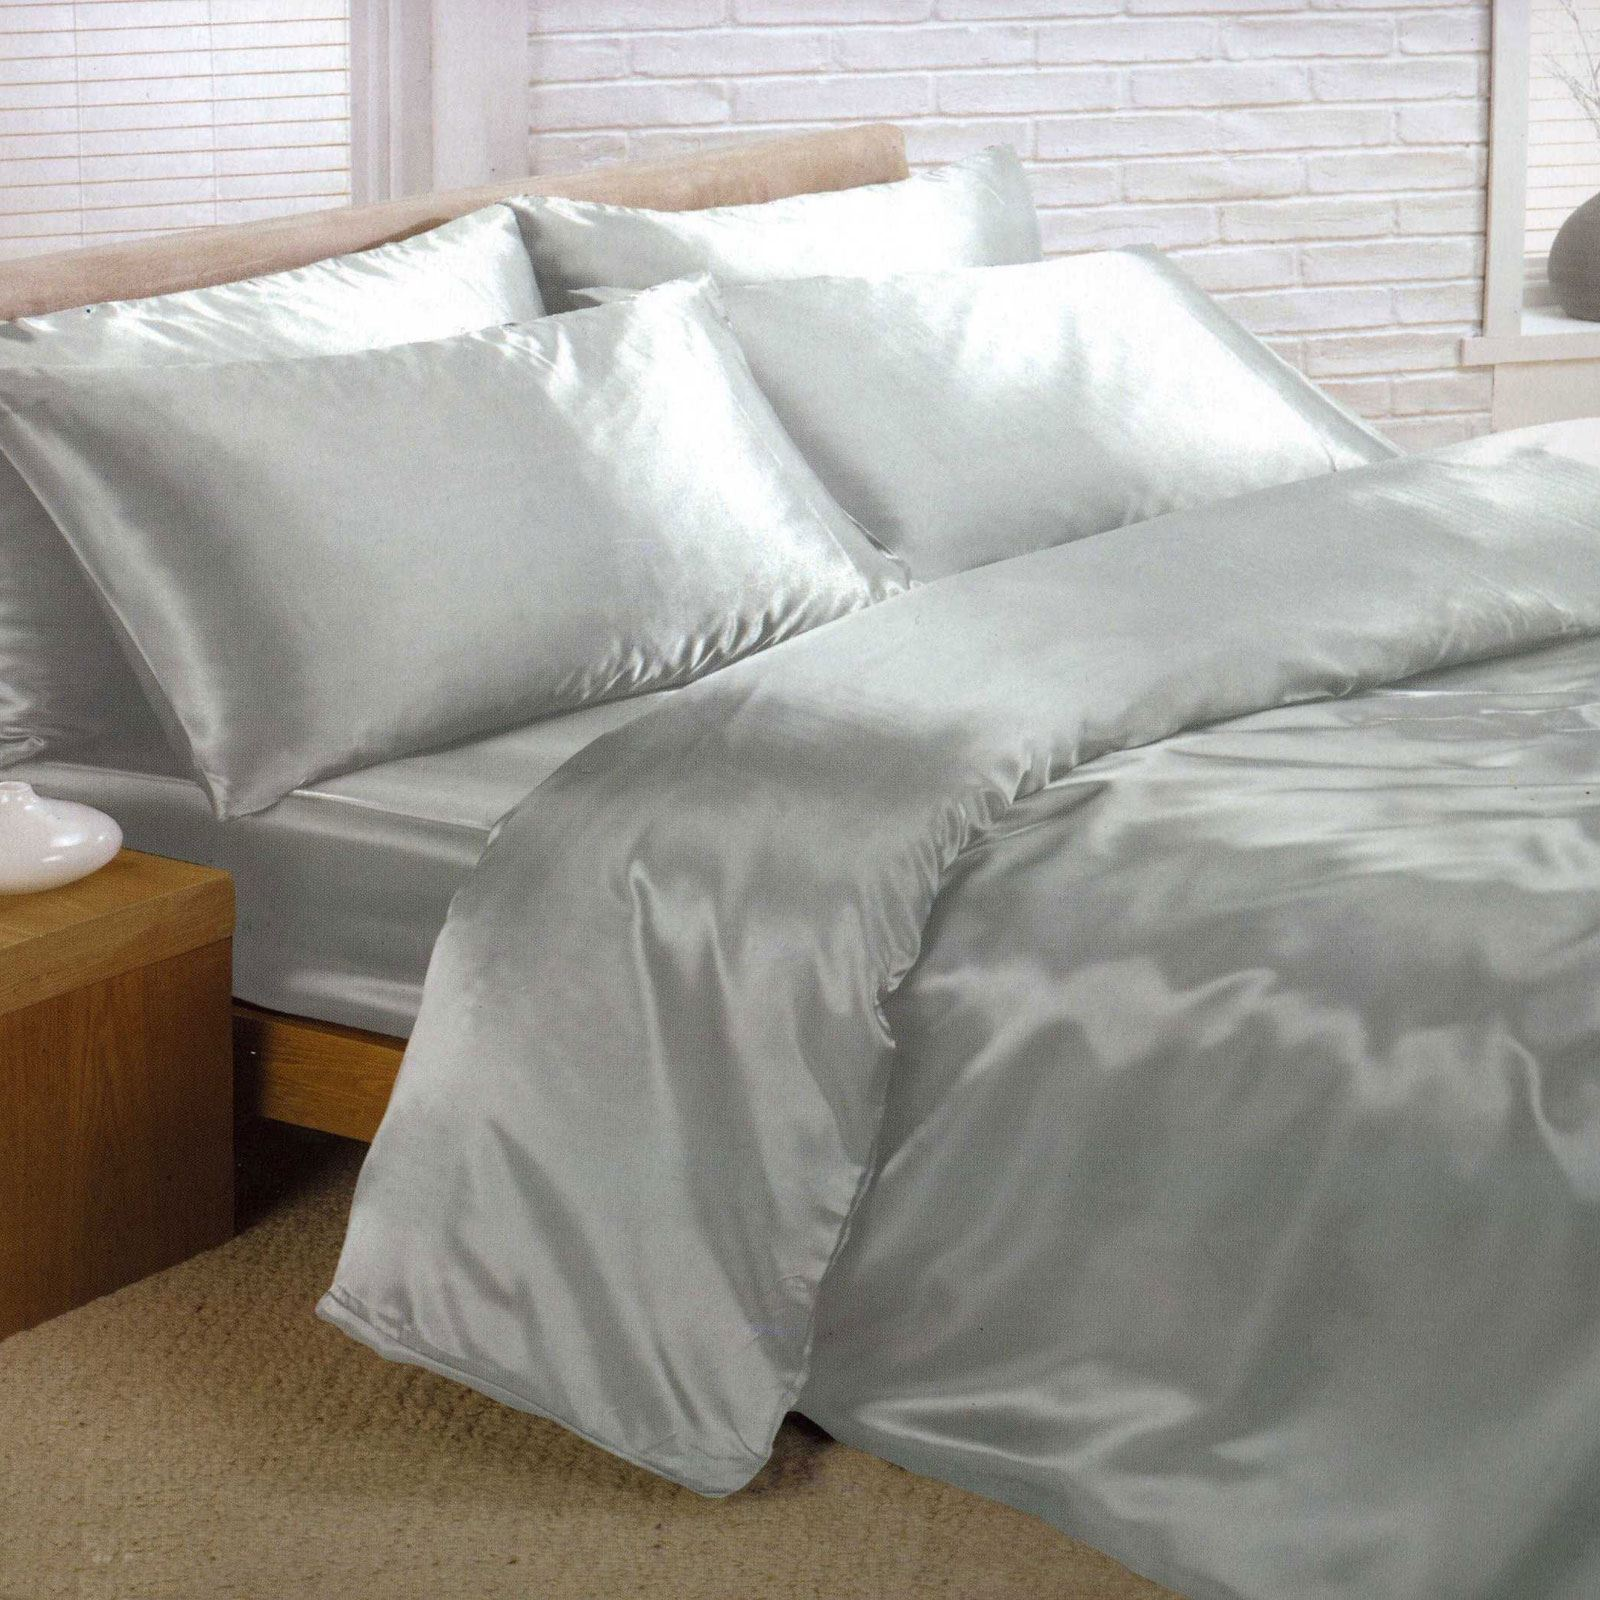 satin bedding sets duvet cover fitted sheet pillowcases ebay. Black Bedroom Furniture Sets. Home Design Ideas